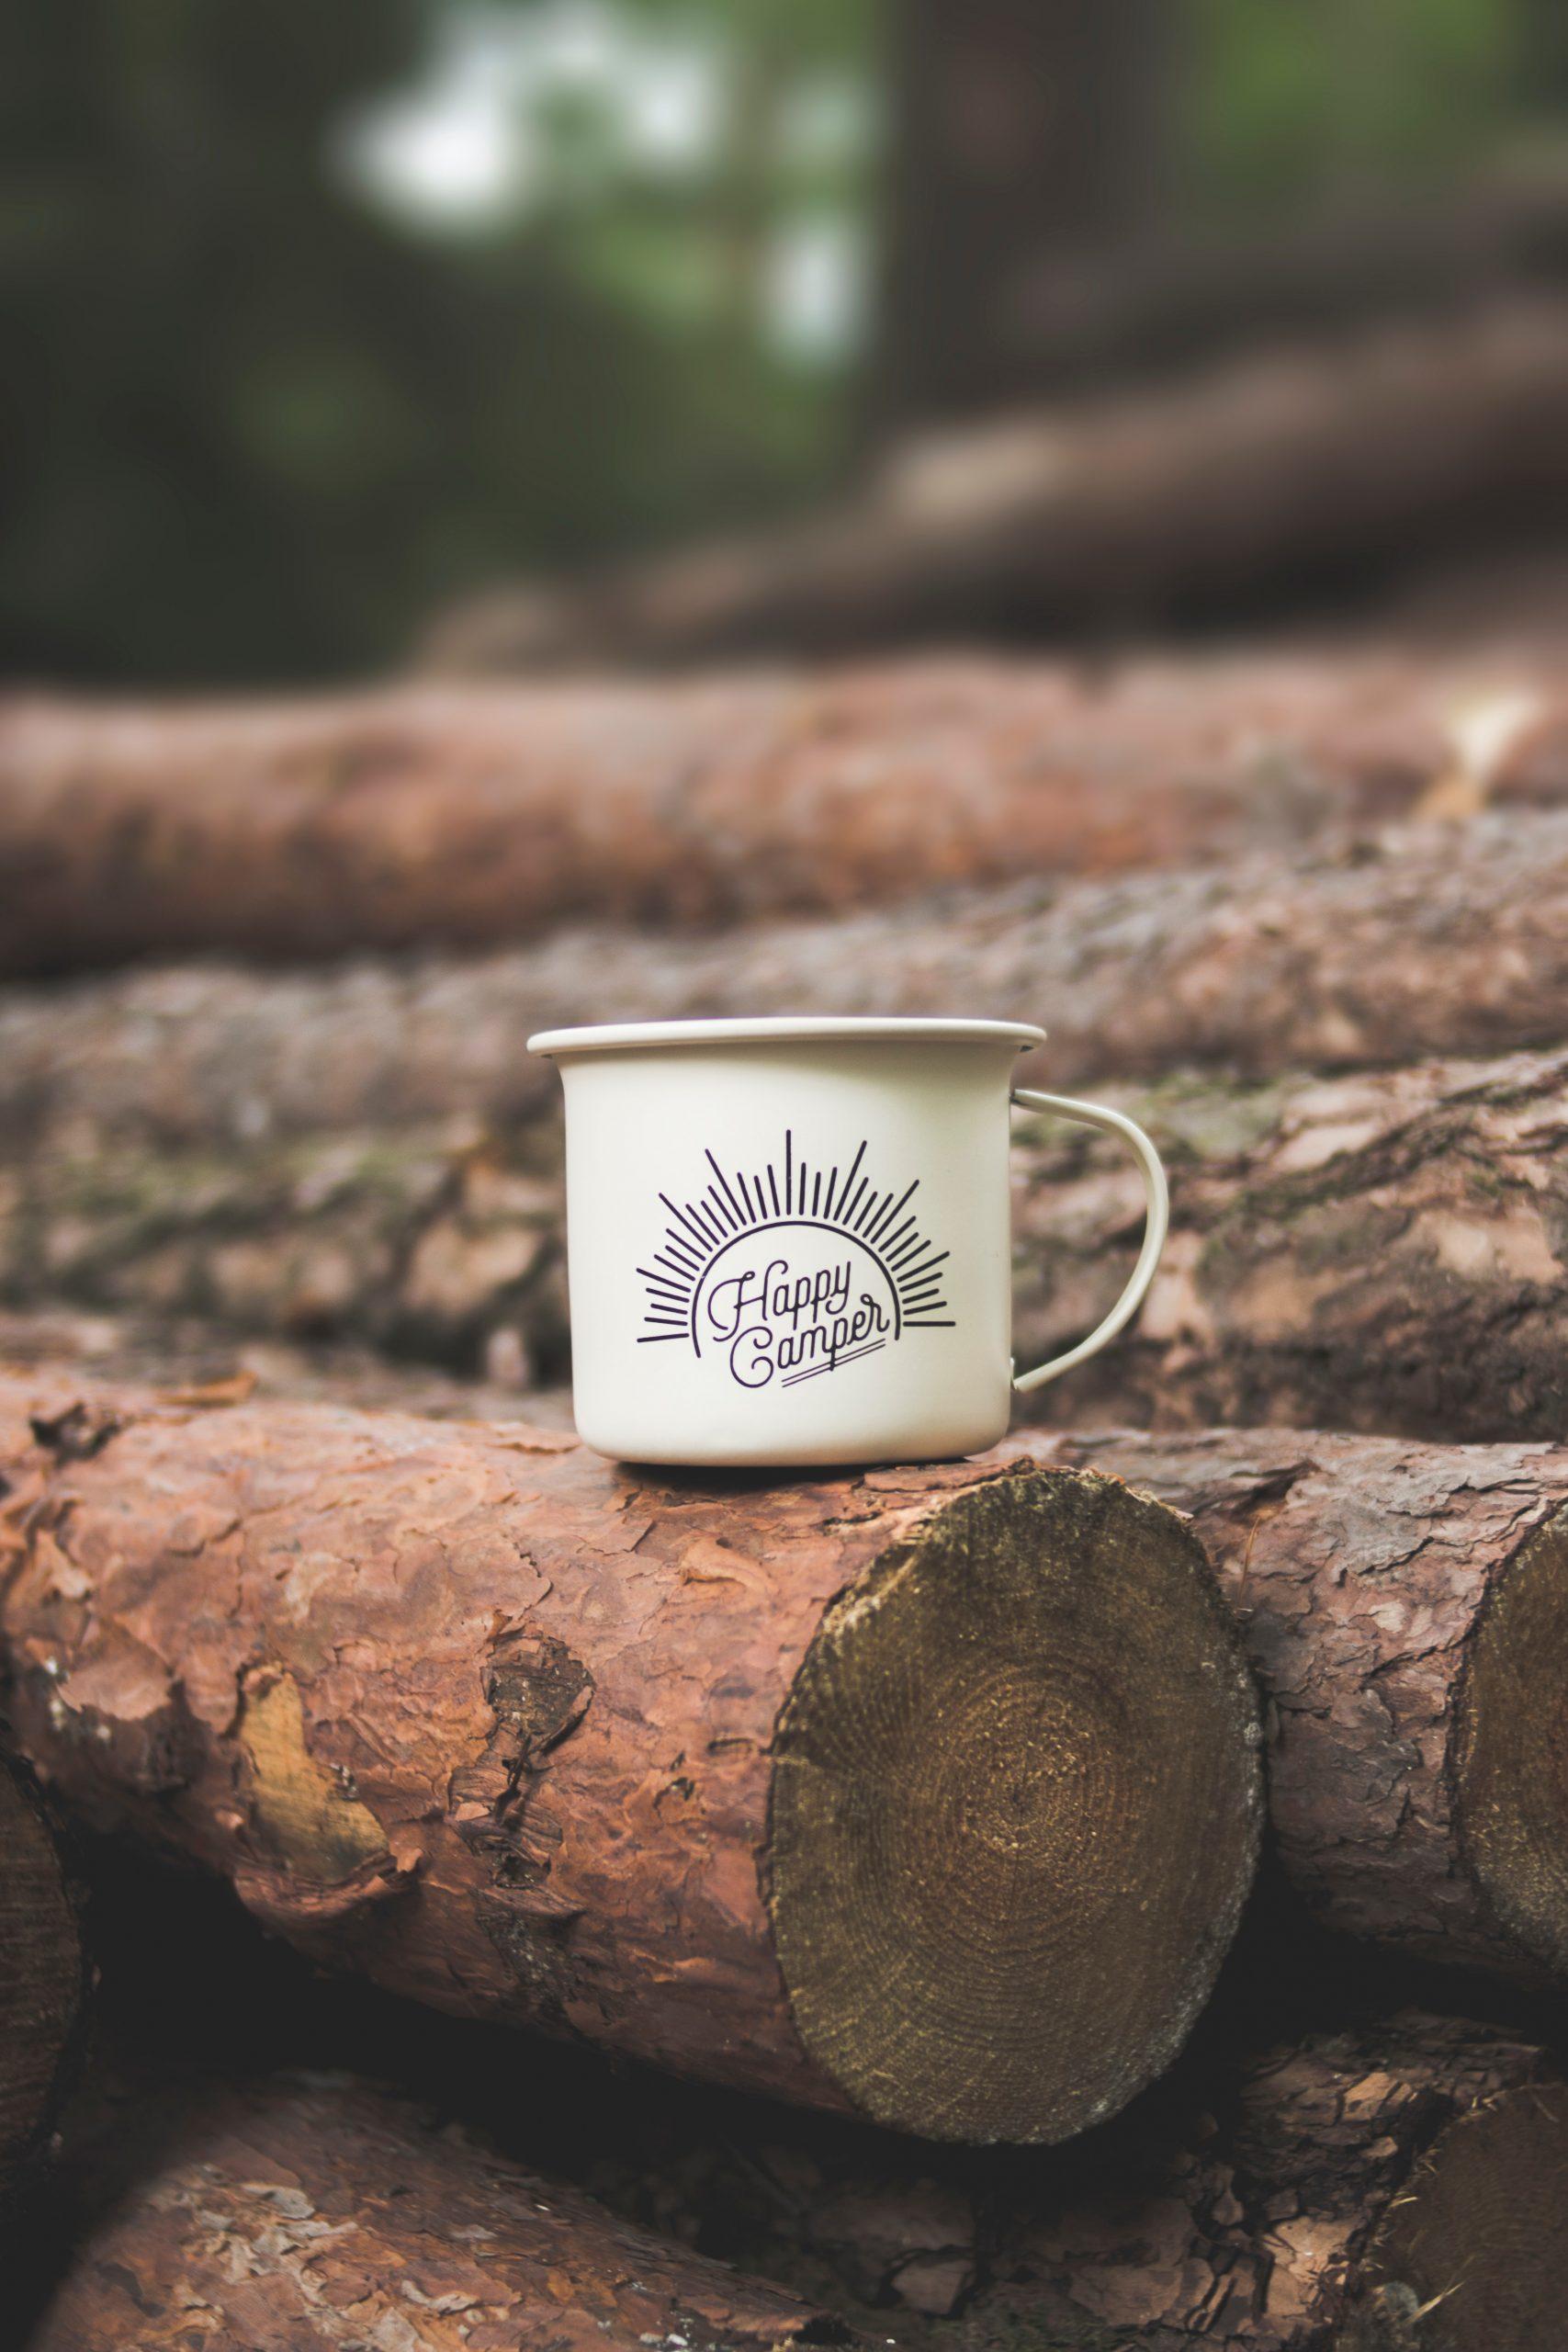 Happer Camper coffee mug